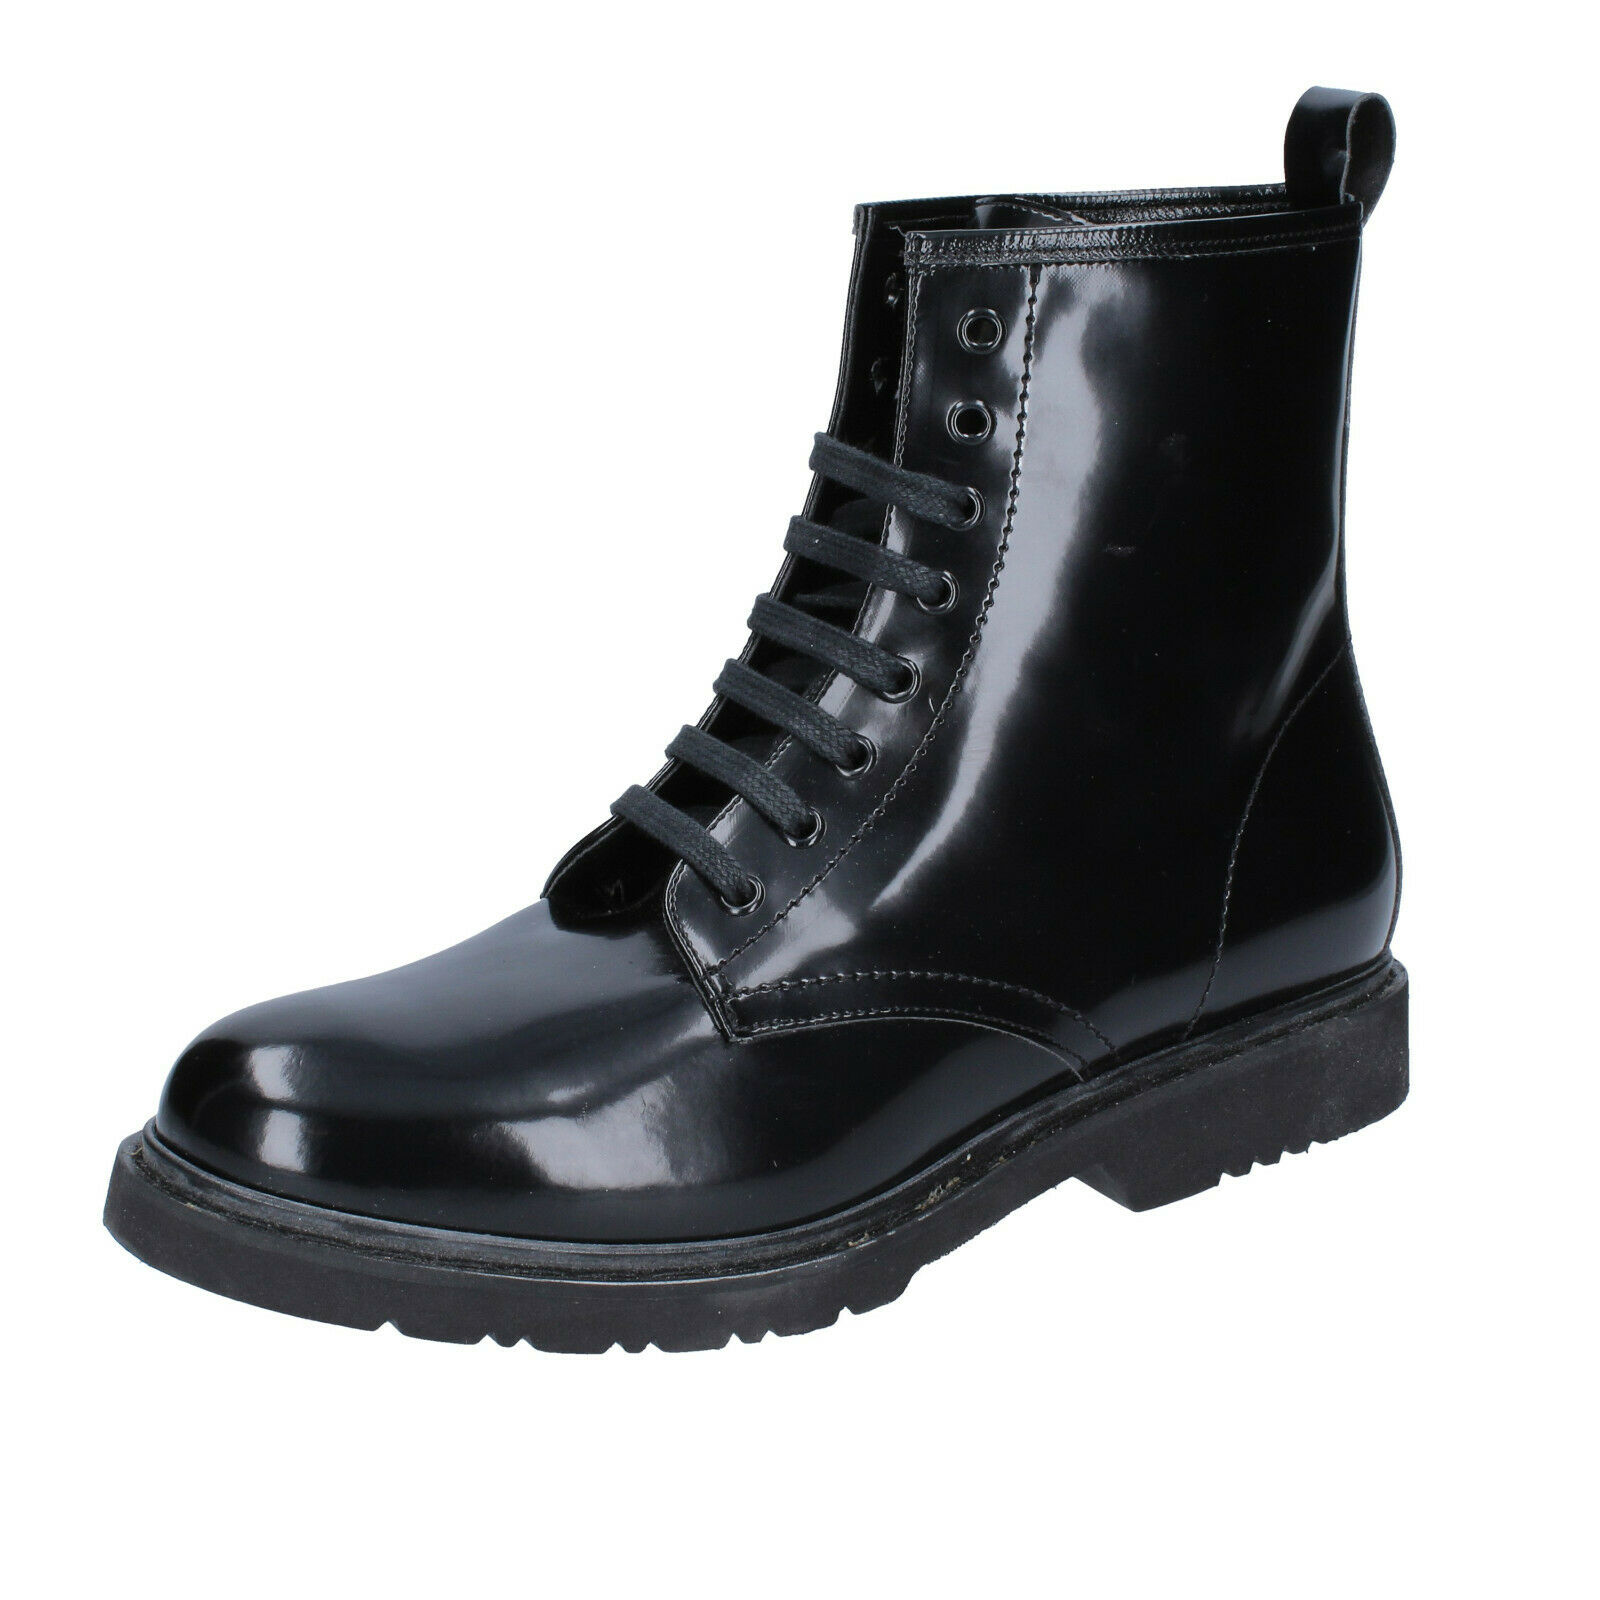 Women's shoes OLGA RUBINI 7 (EU 40) ankle boots black leather BS862-40